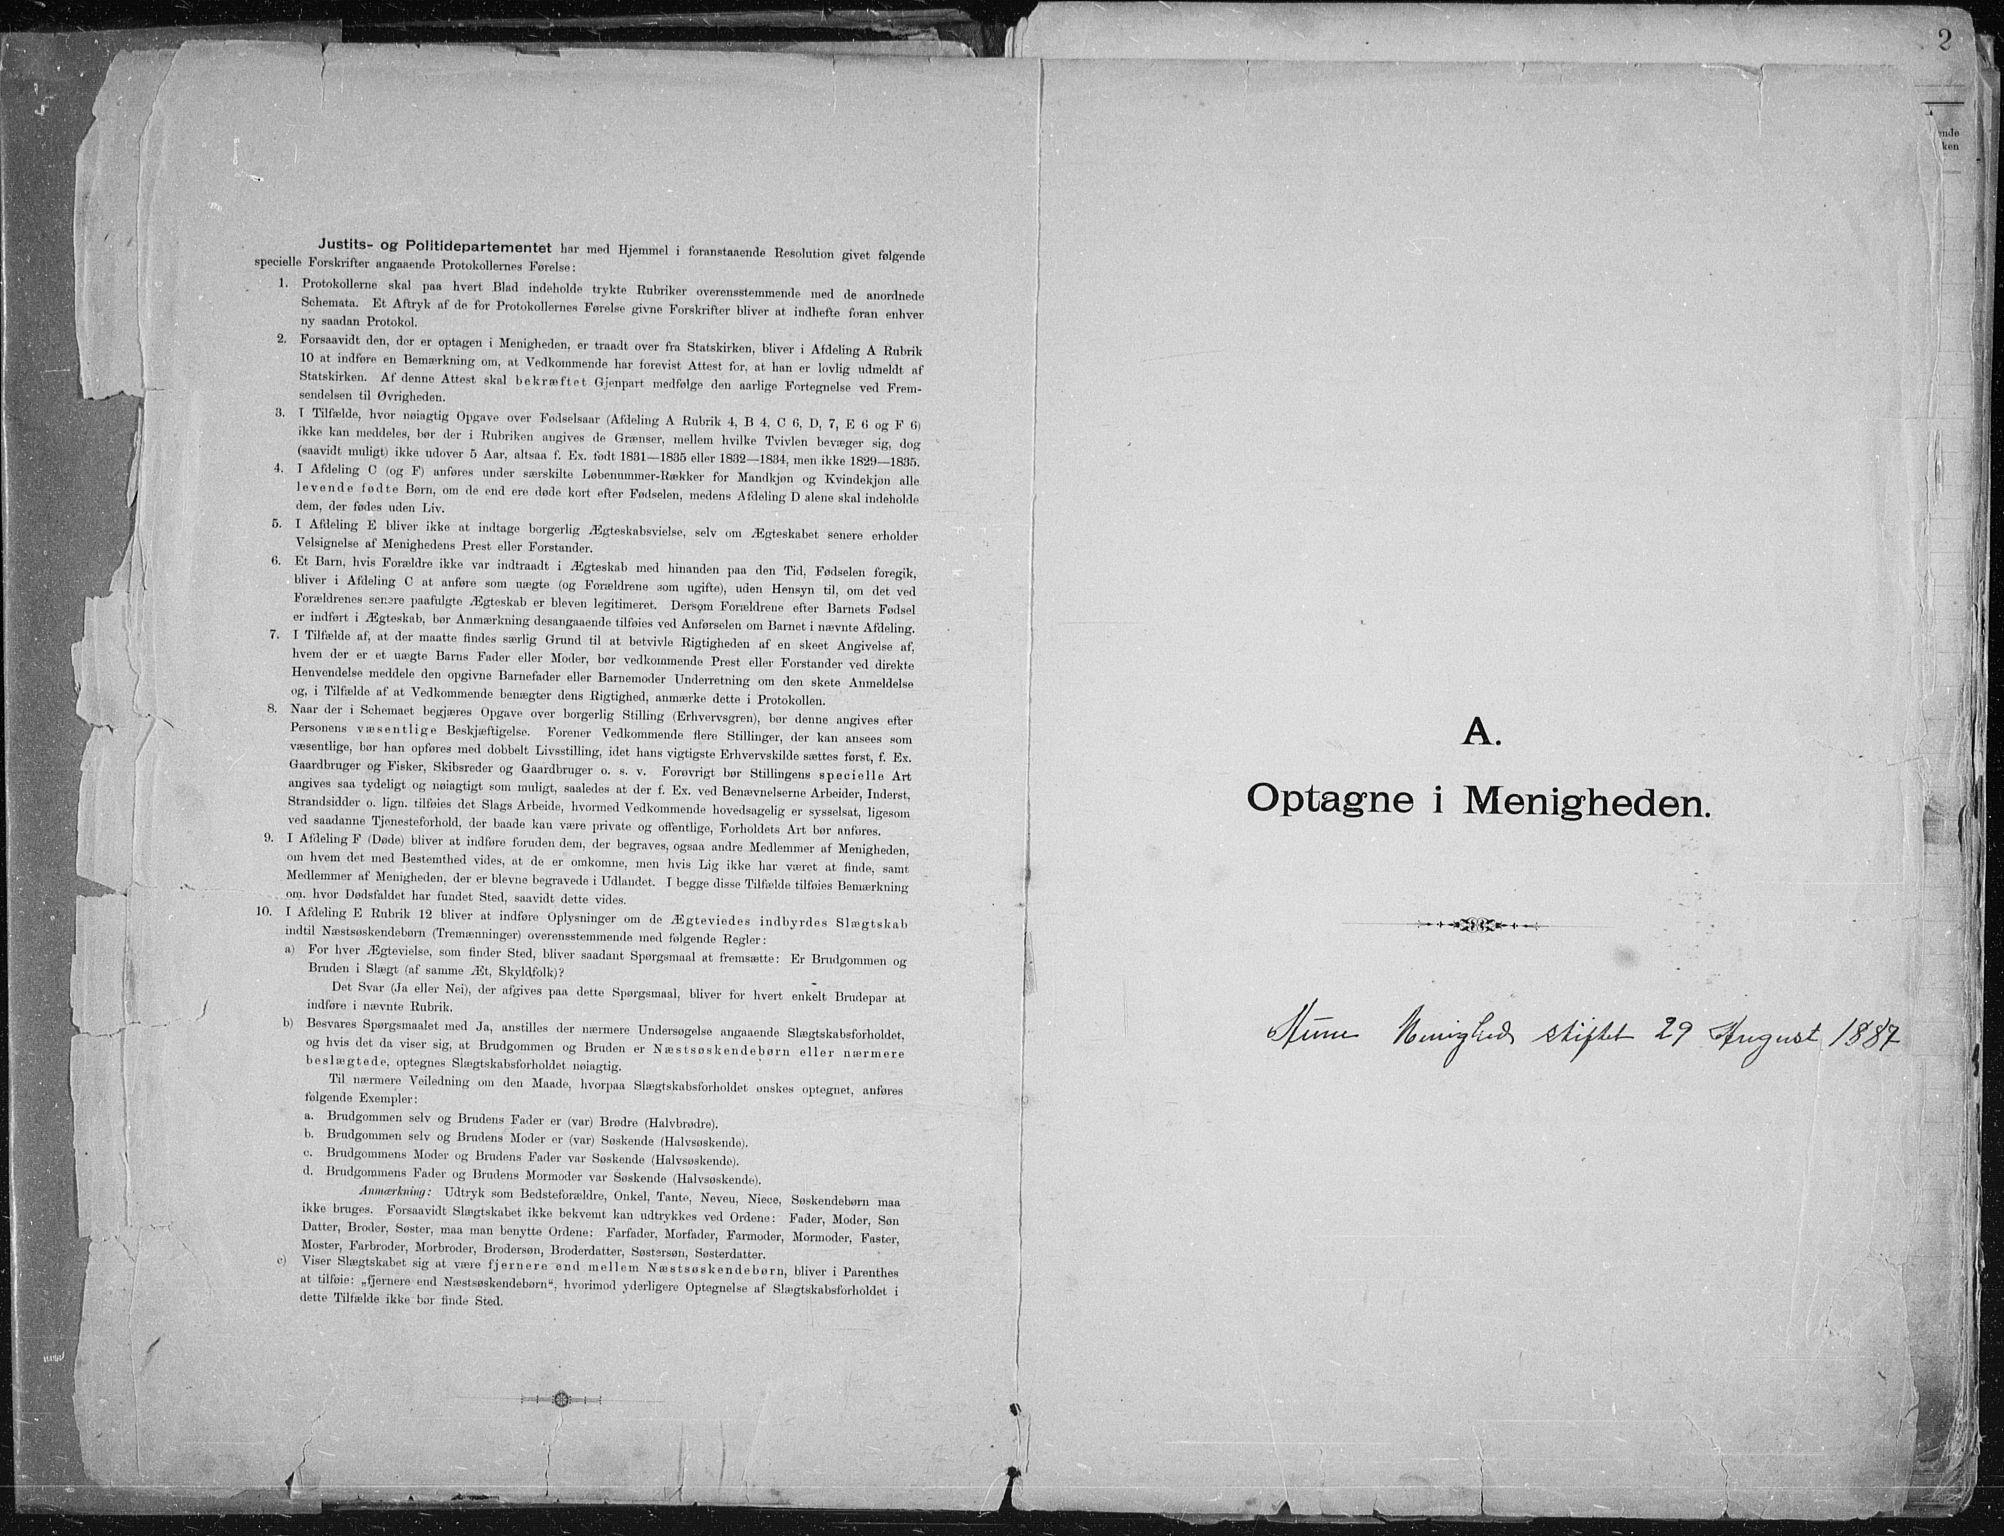 SATØ, Aune baptistmenighet, F/L0006DP: Dissenter register no. 6, 1887-1939